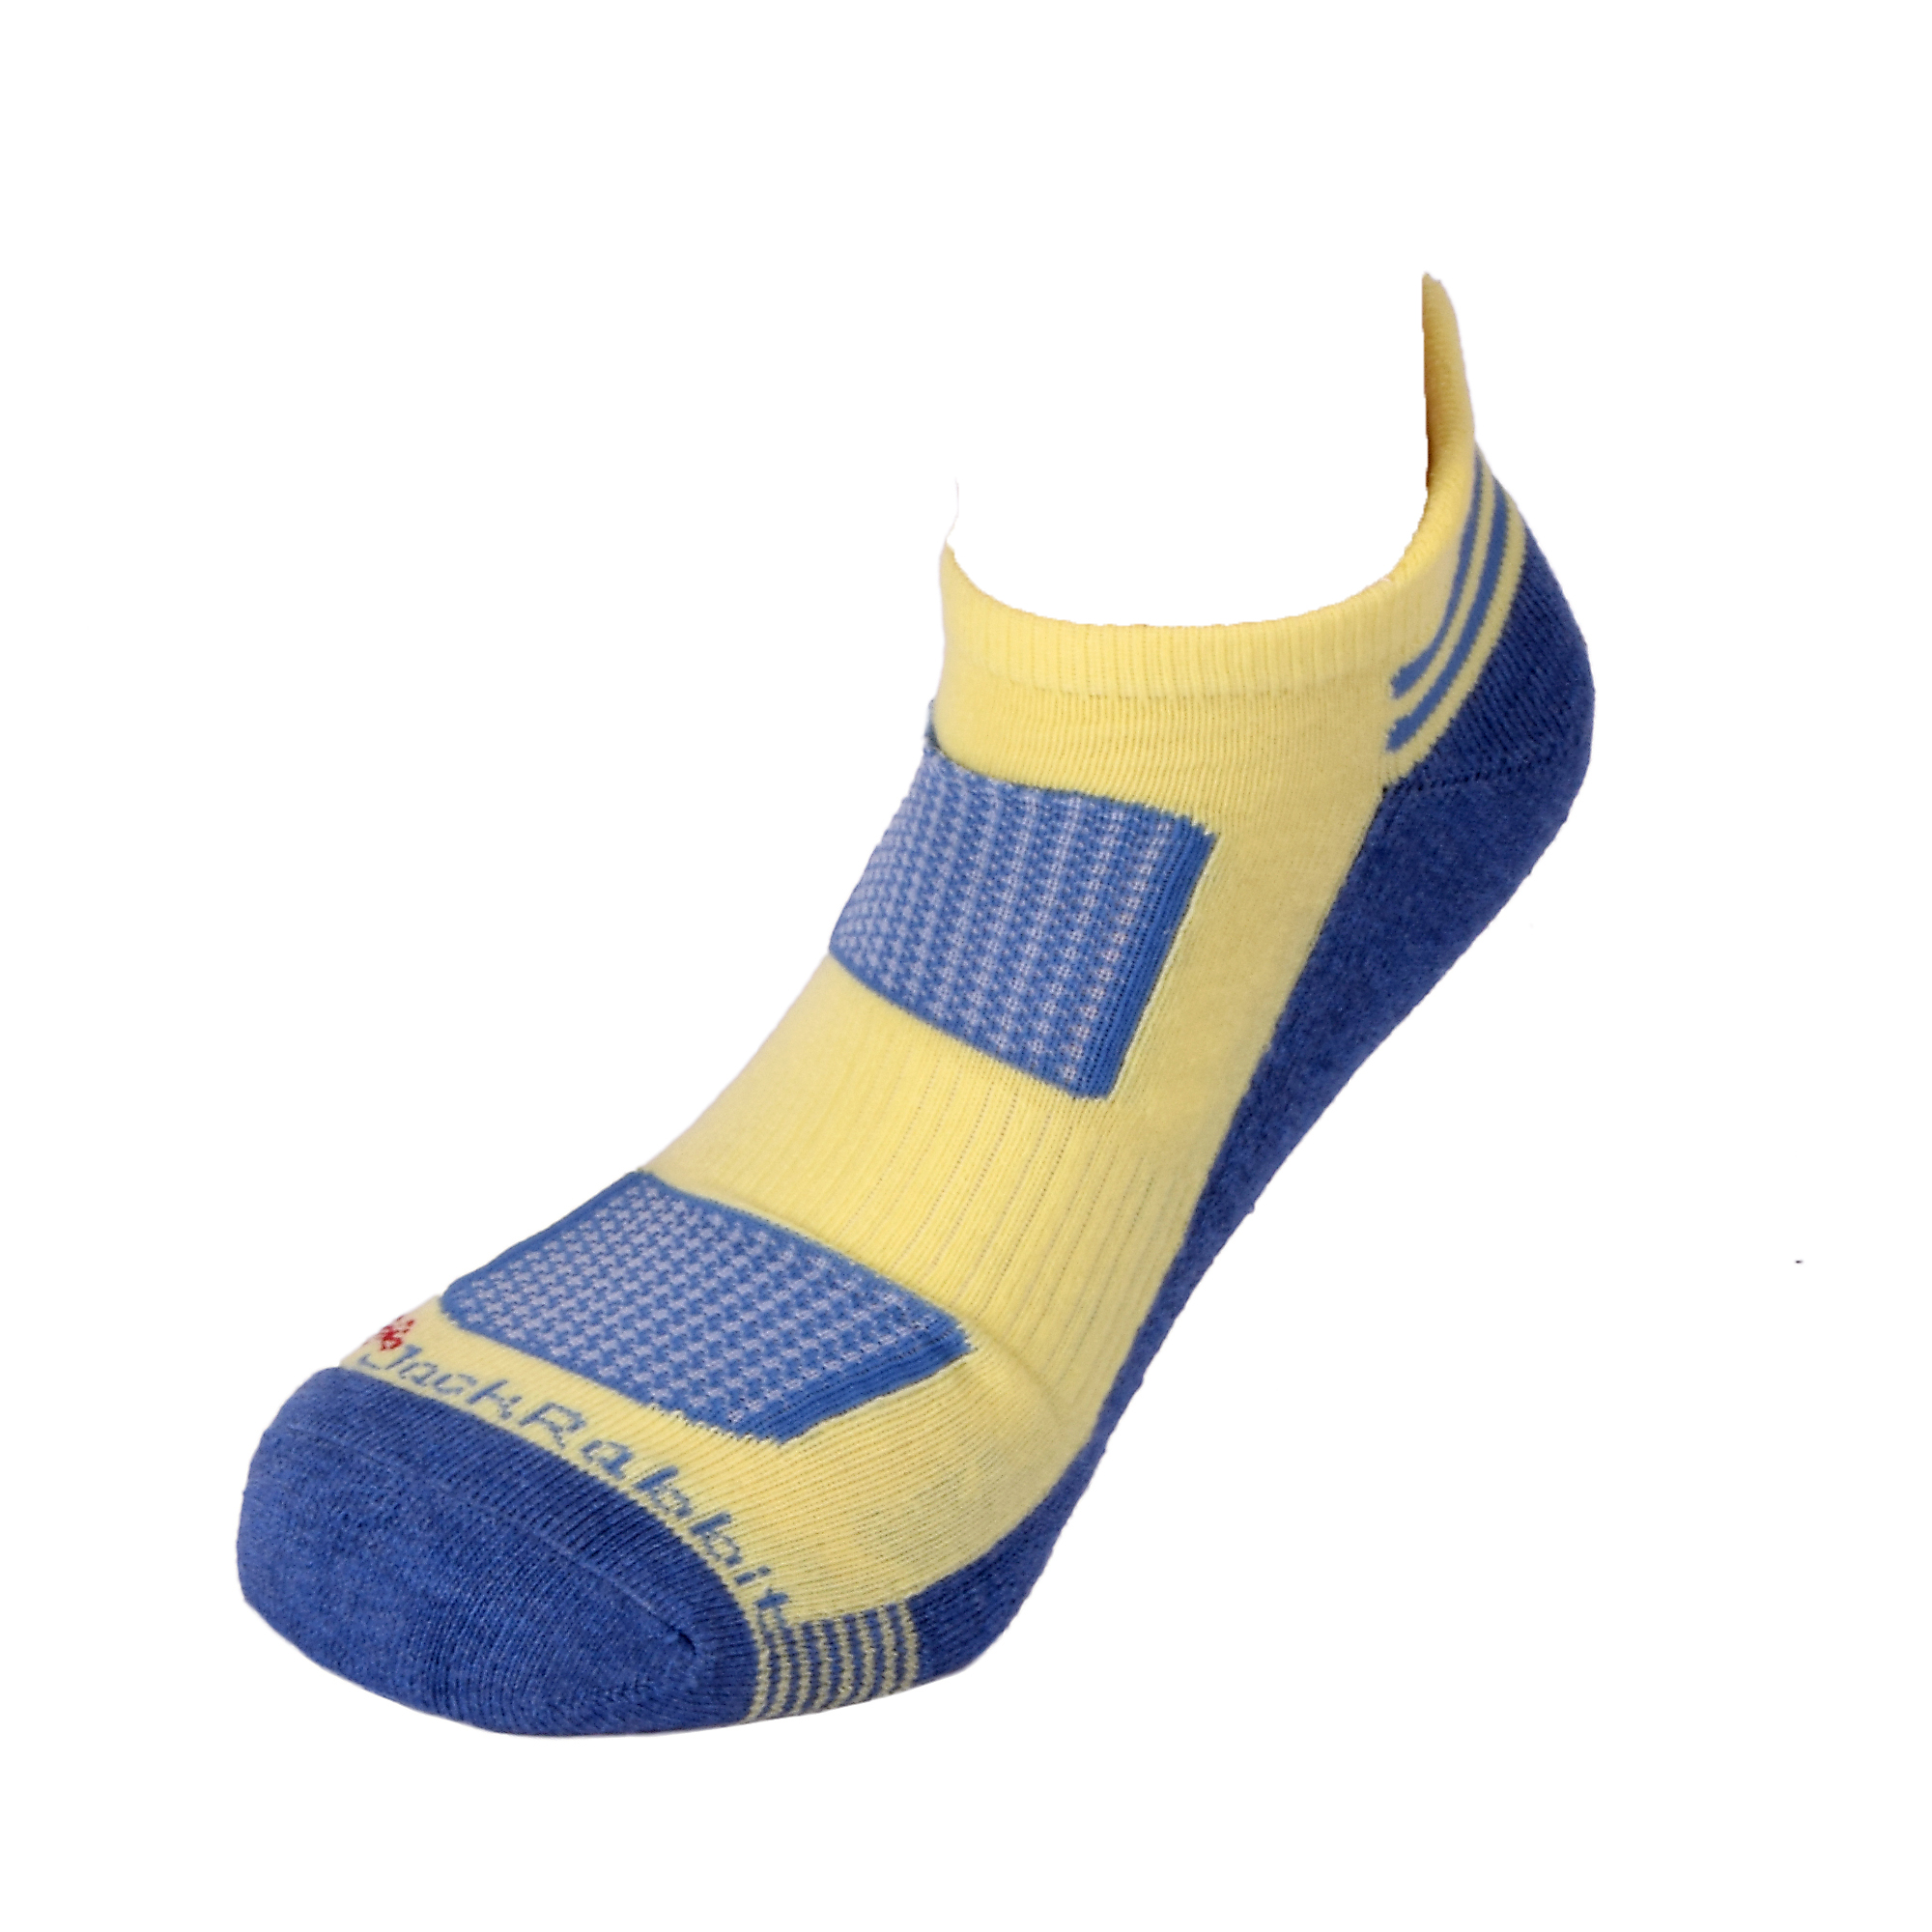 JackRabbit No Show Tab Cushion Socks 1 Pack - Color: Yellow/Navy - Size: S, Yellow/Navy, large, image 2